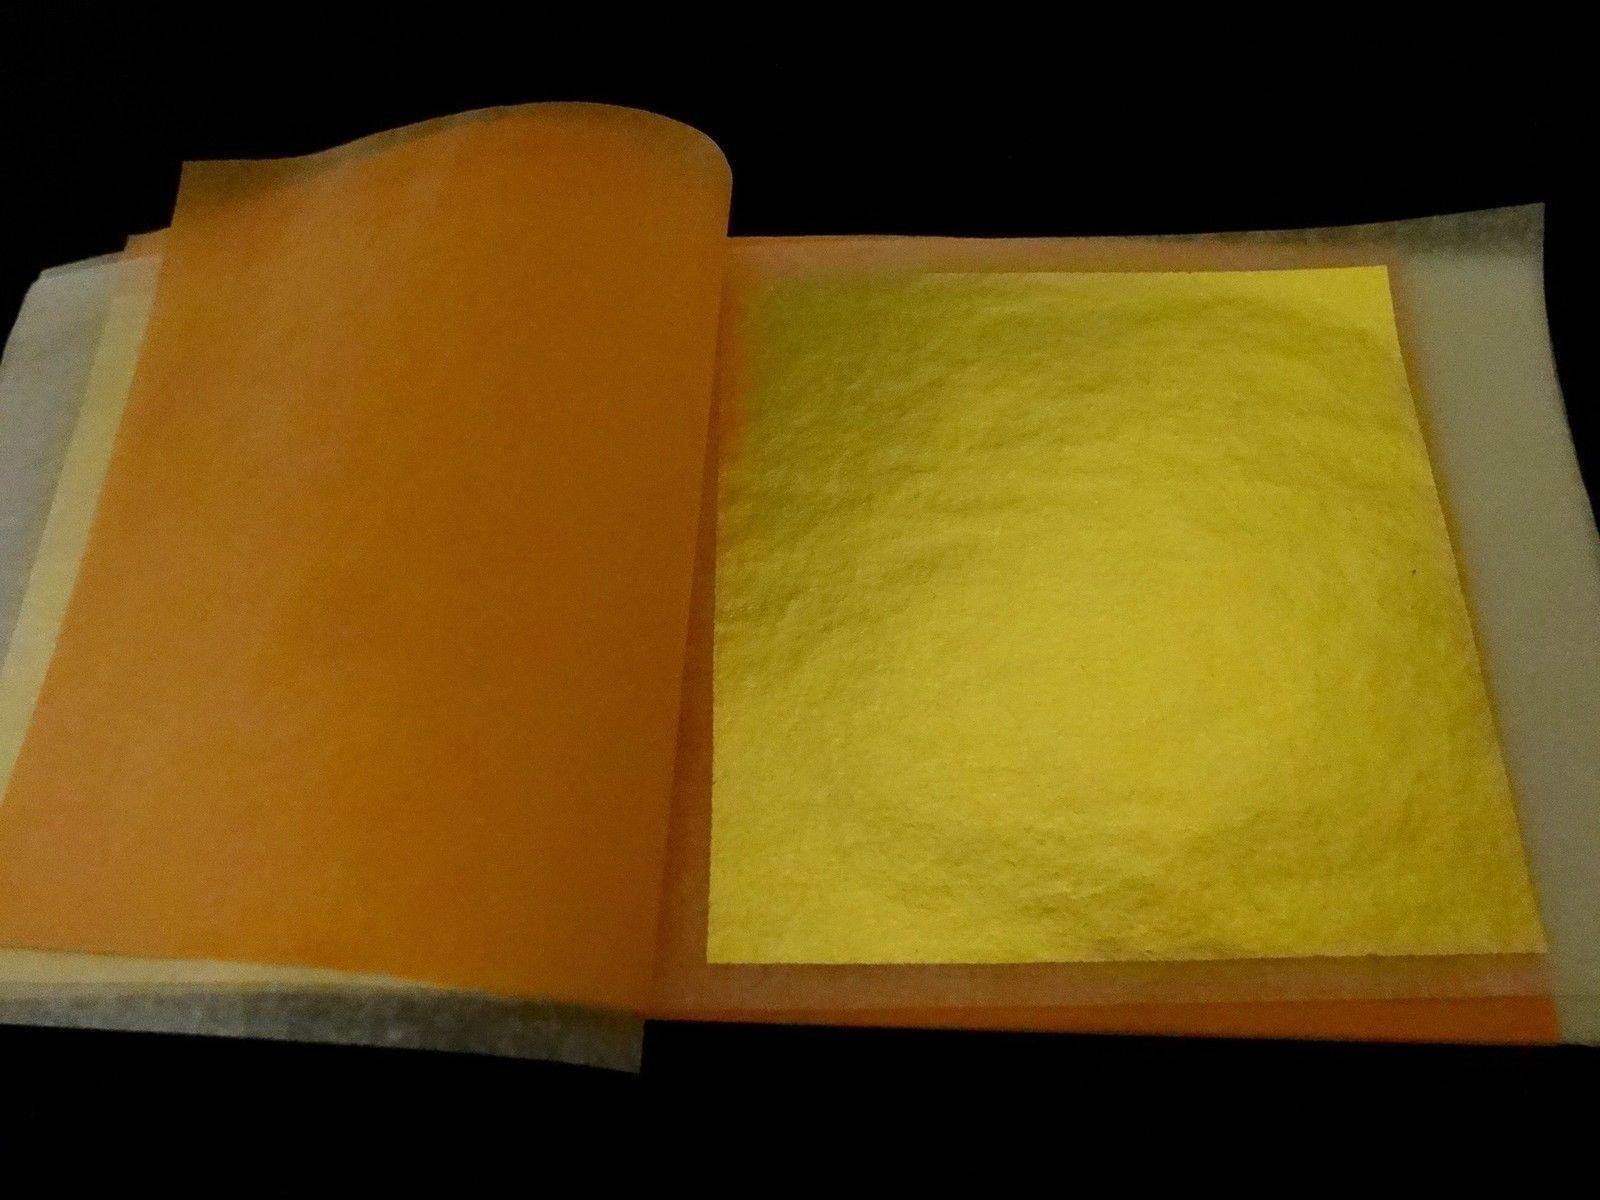 Genuine Gold Leaves (Transfer) (23k, 20 booklets (500 sheets))